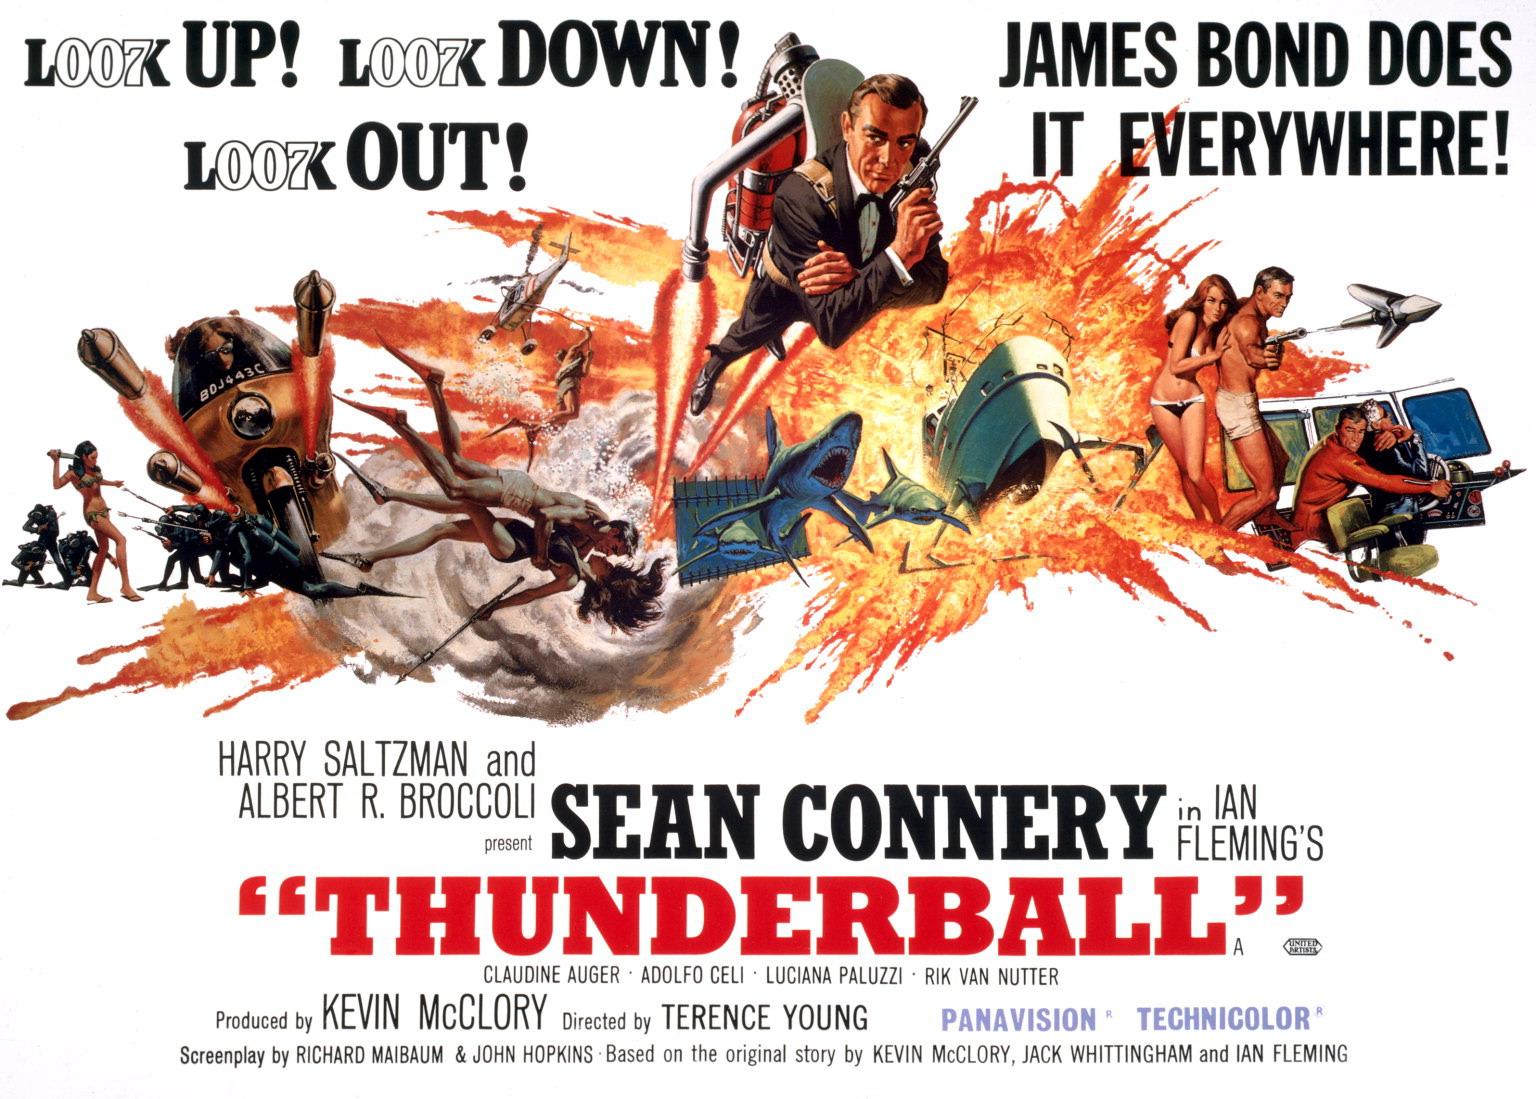 Tom Jones Feuerball Thunderball